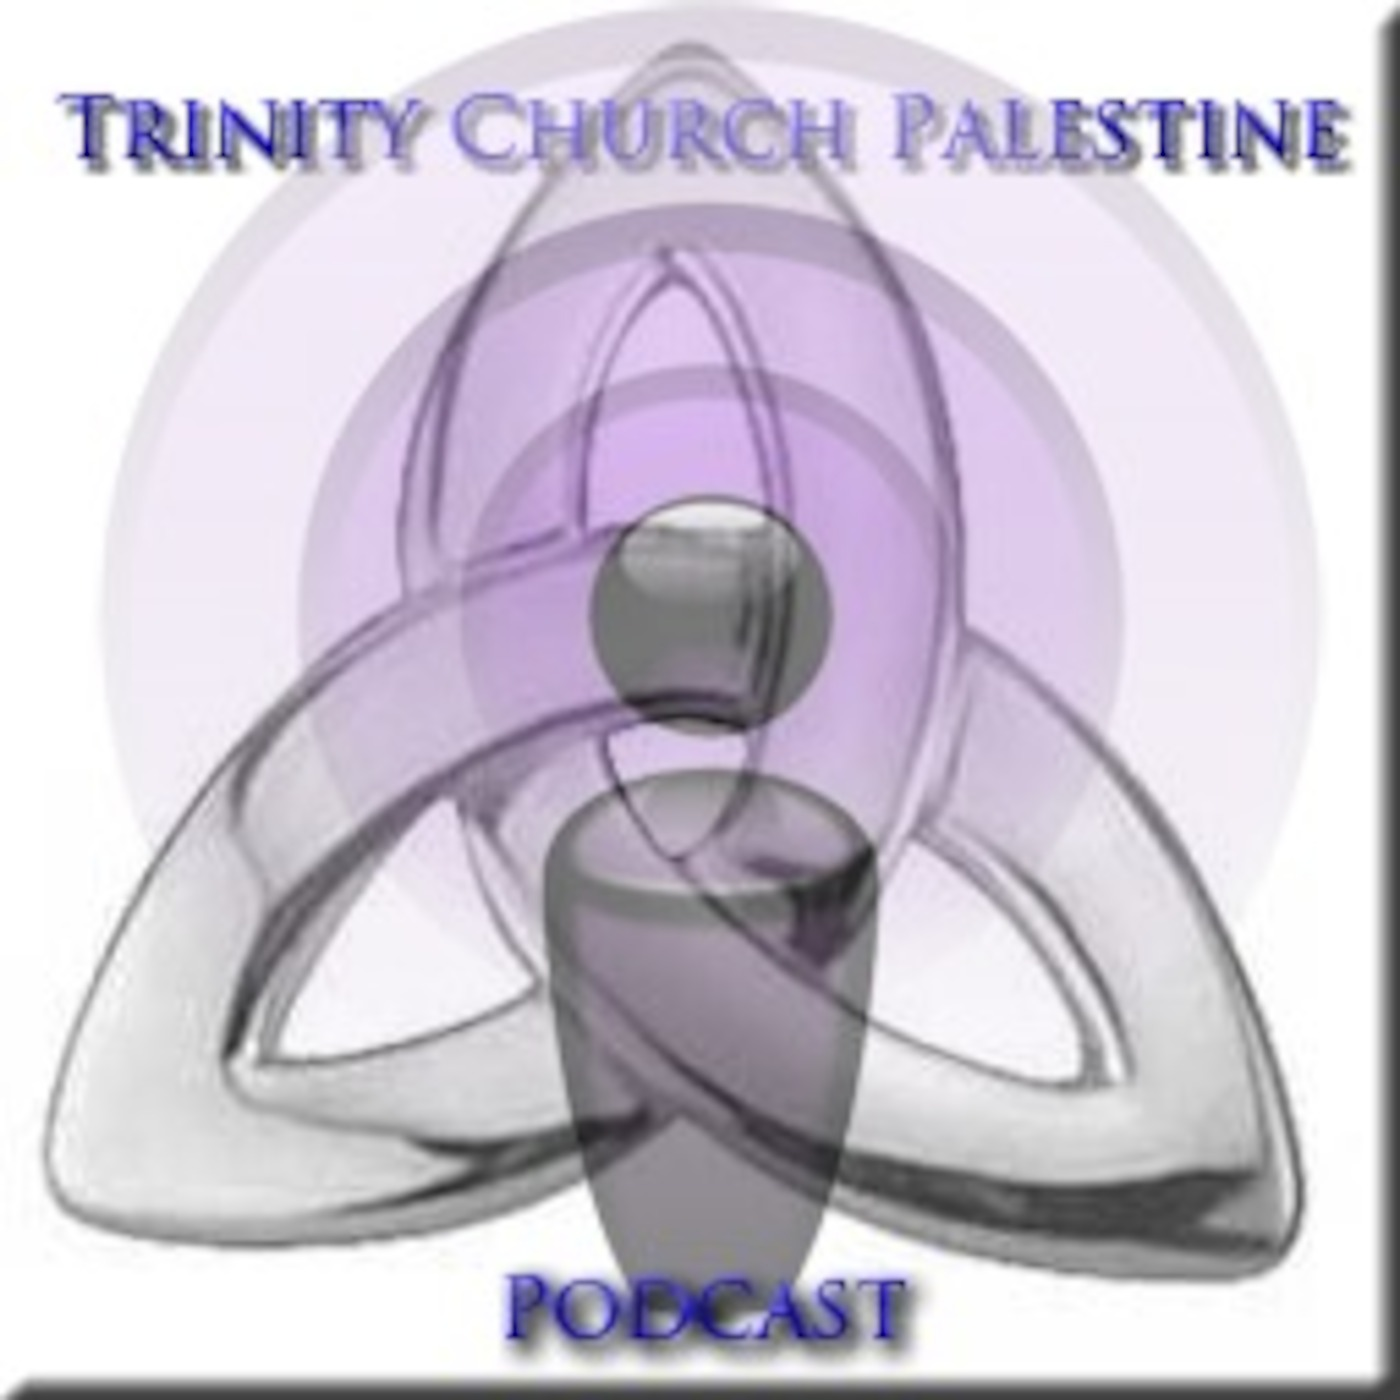 Trinity Church Palestine Podcast